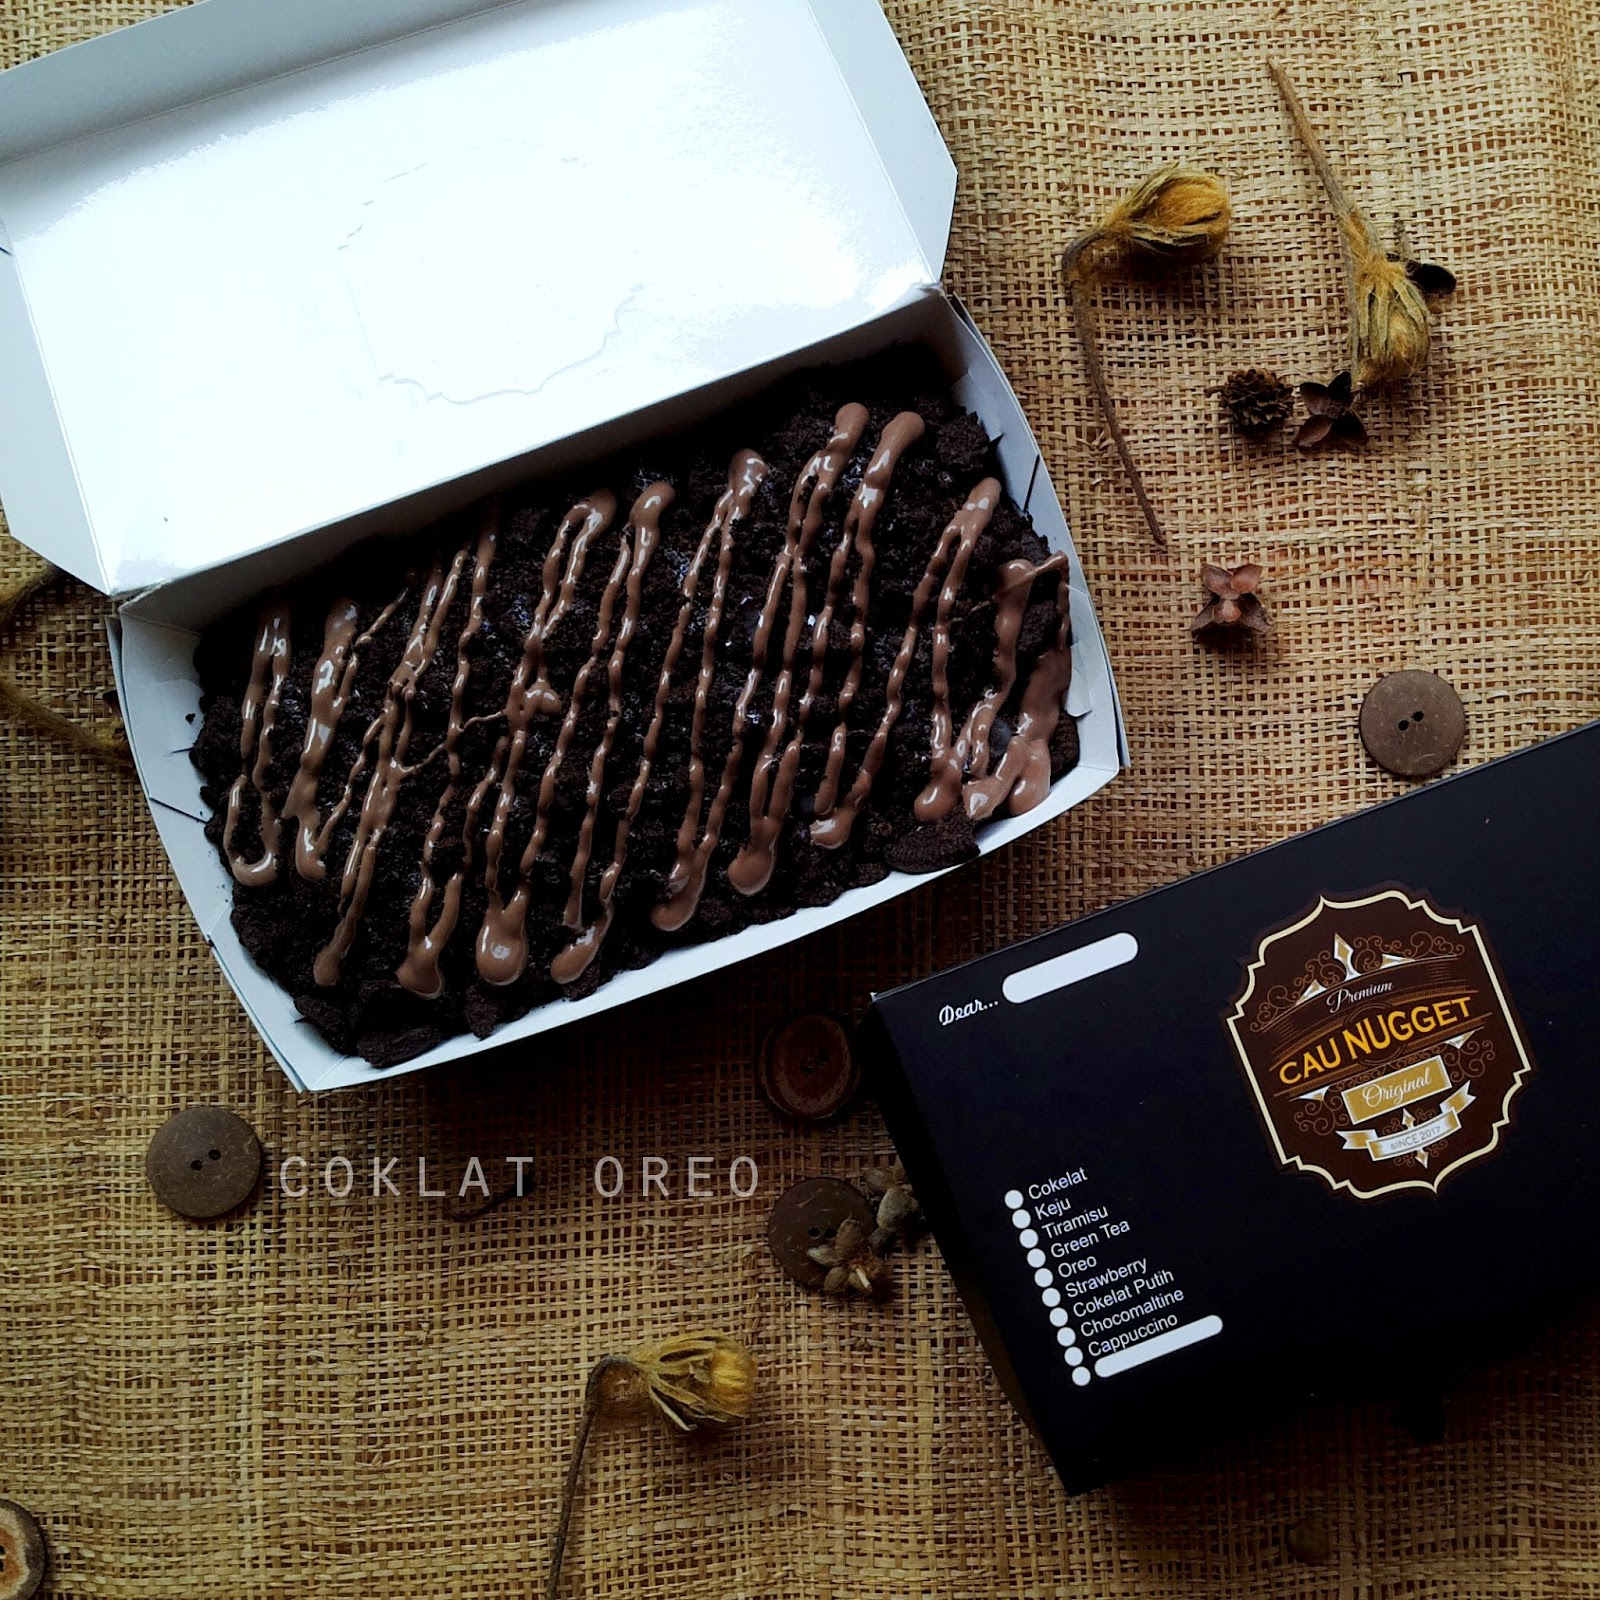 Cau Nugget Coklat Oreo - Cau Nugget